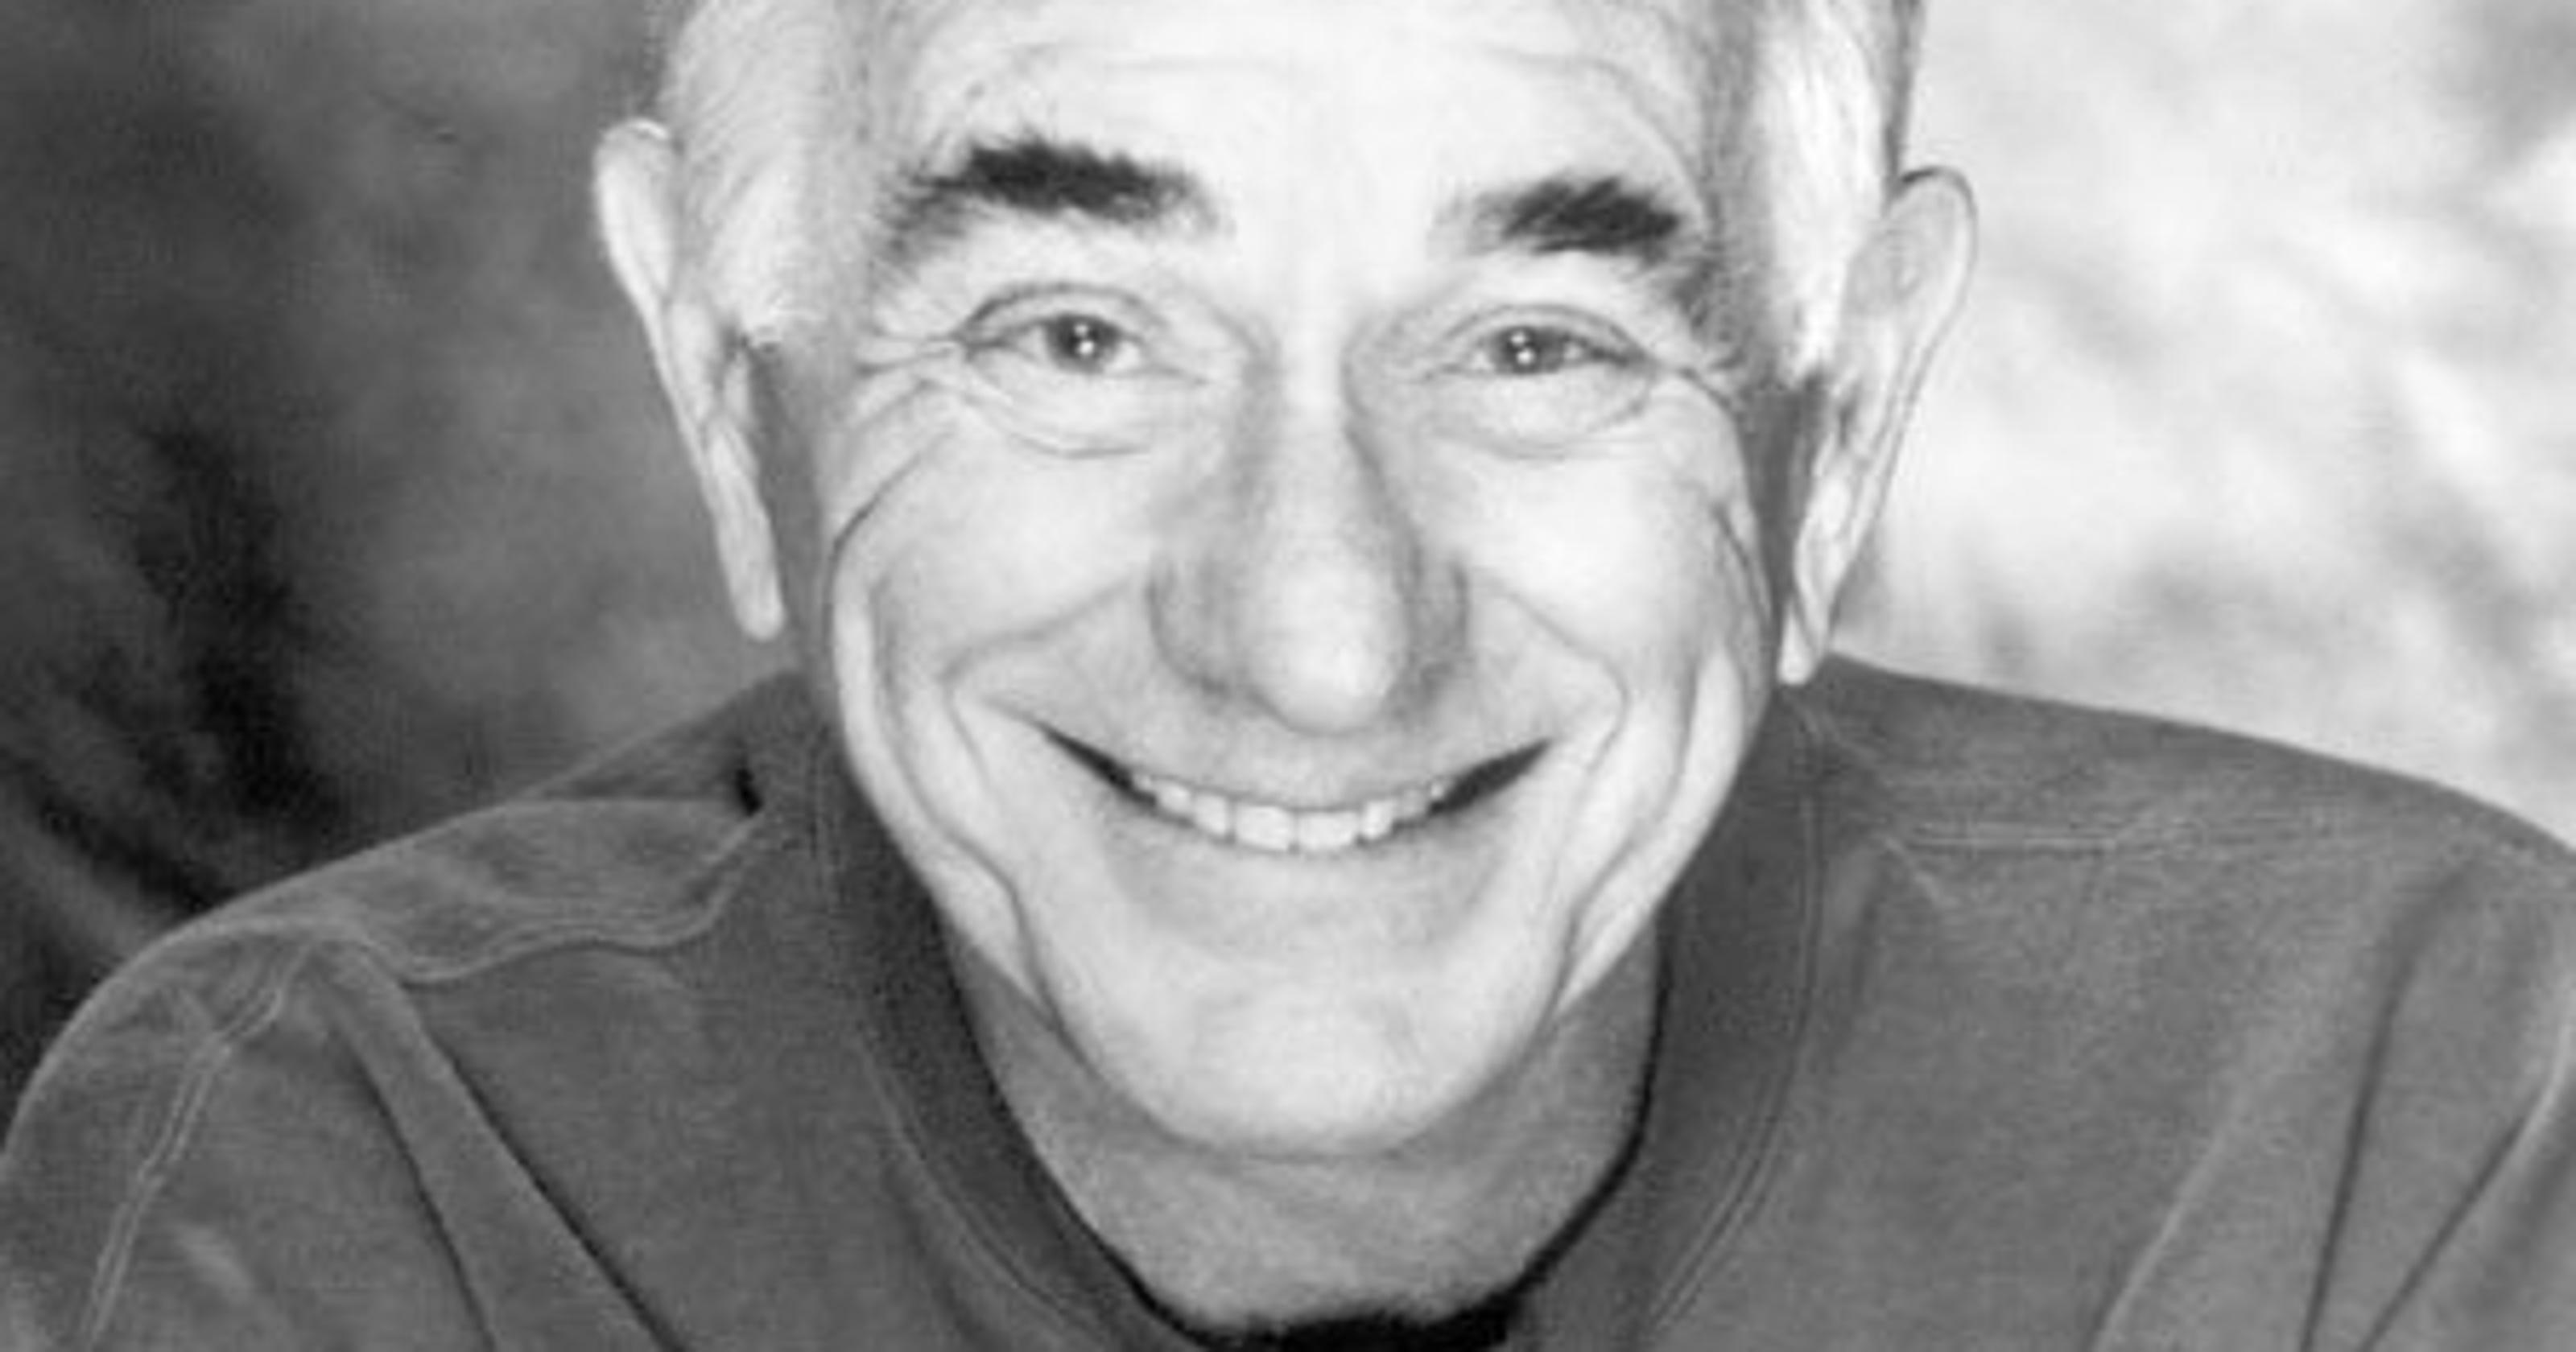 ead380b76a9 Trailblazing comic Shelley Berman dies at 92